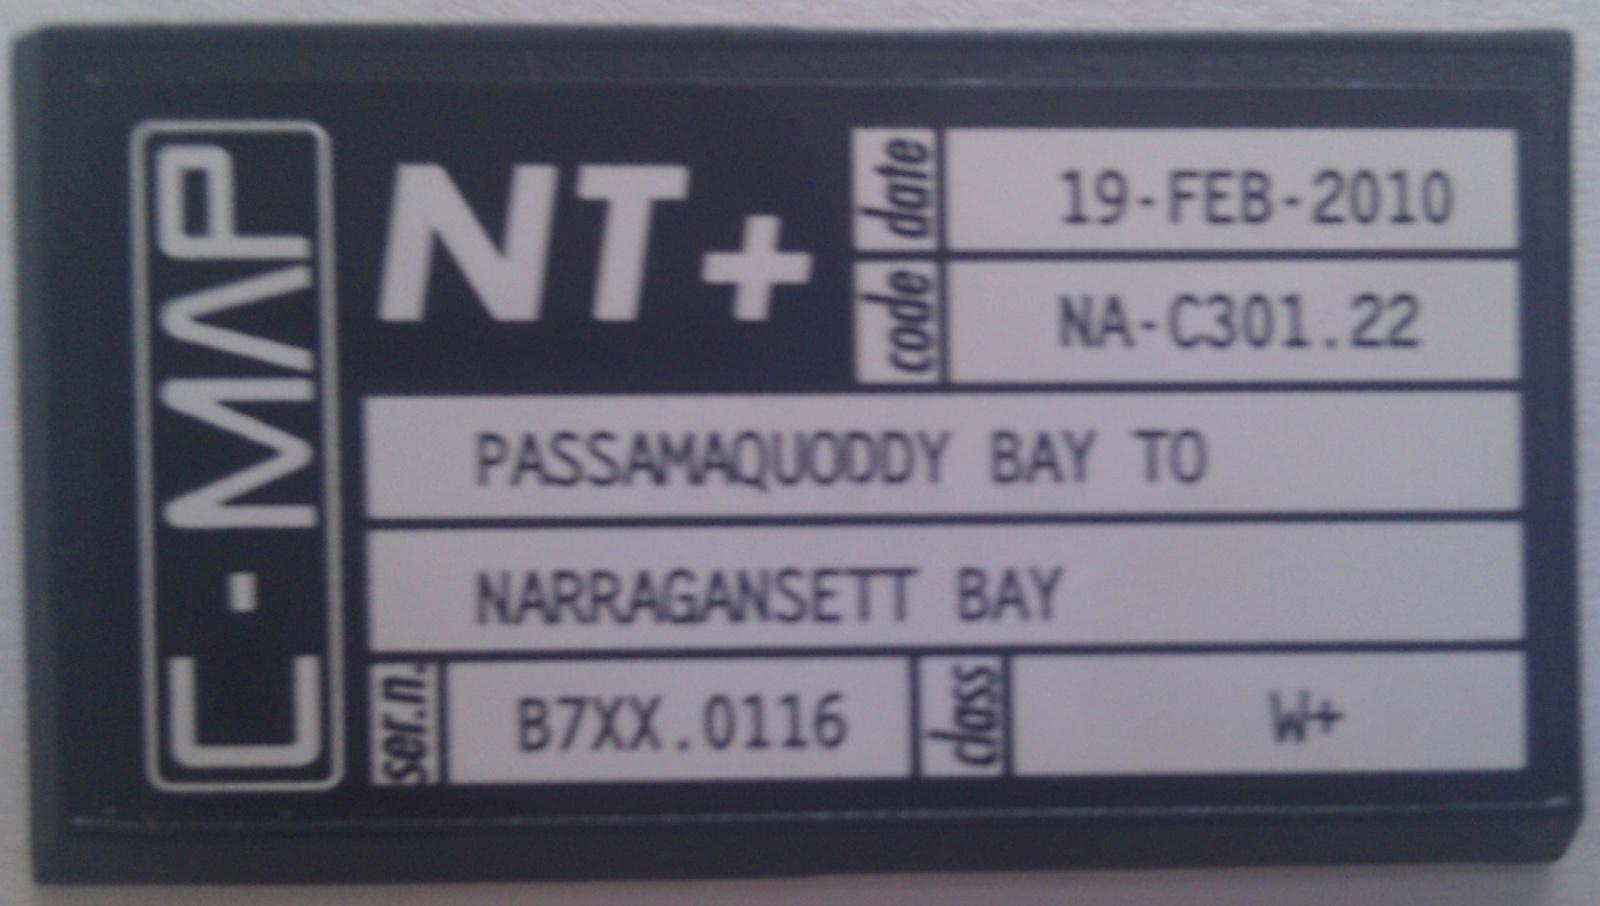 Click image for larger version  Name:C - Map NT+ Passamaquuoody Bay to Narragansett Bay.jpg Views:127 Size:290.3 KB ID:41399